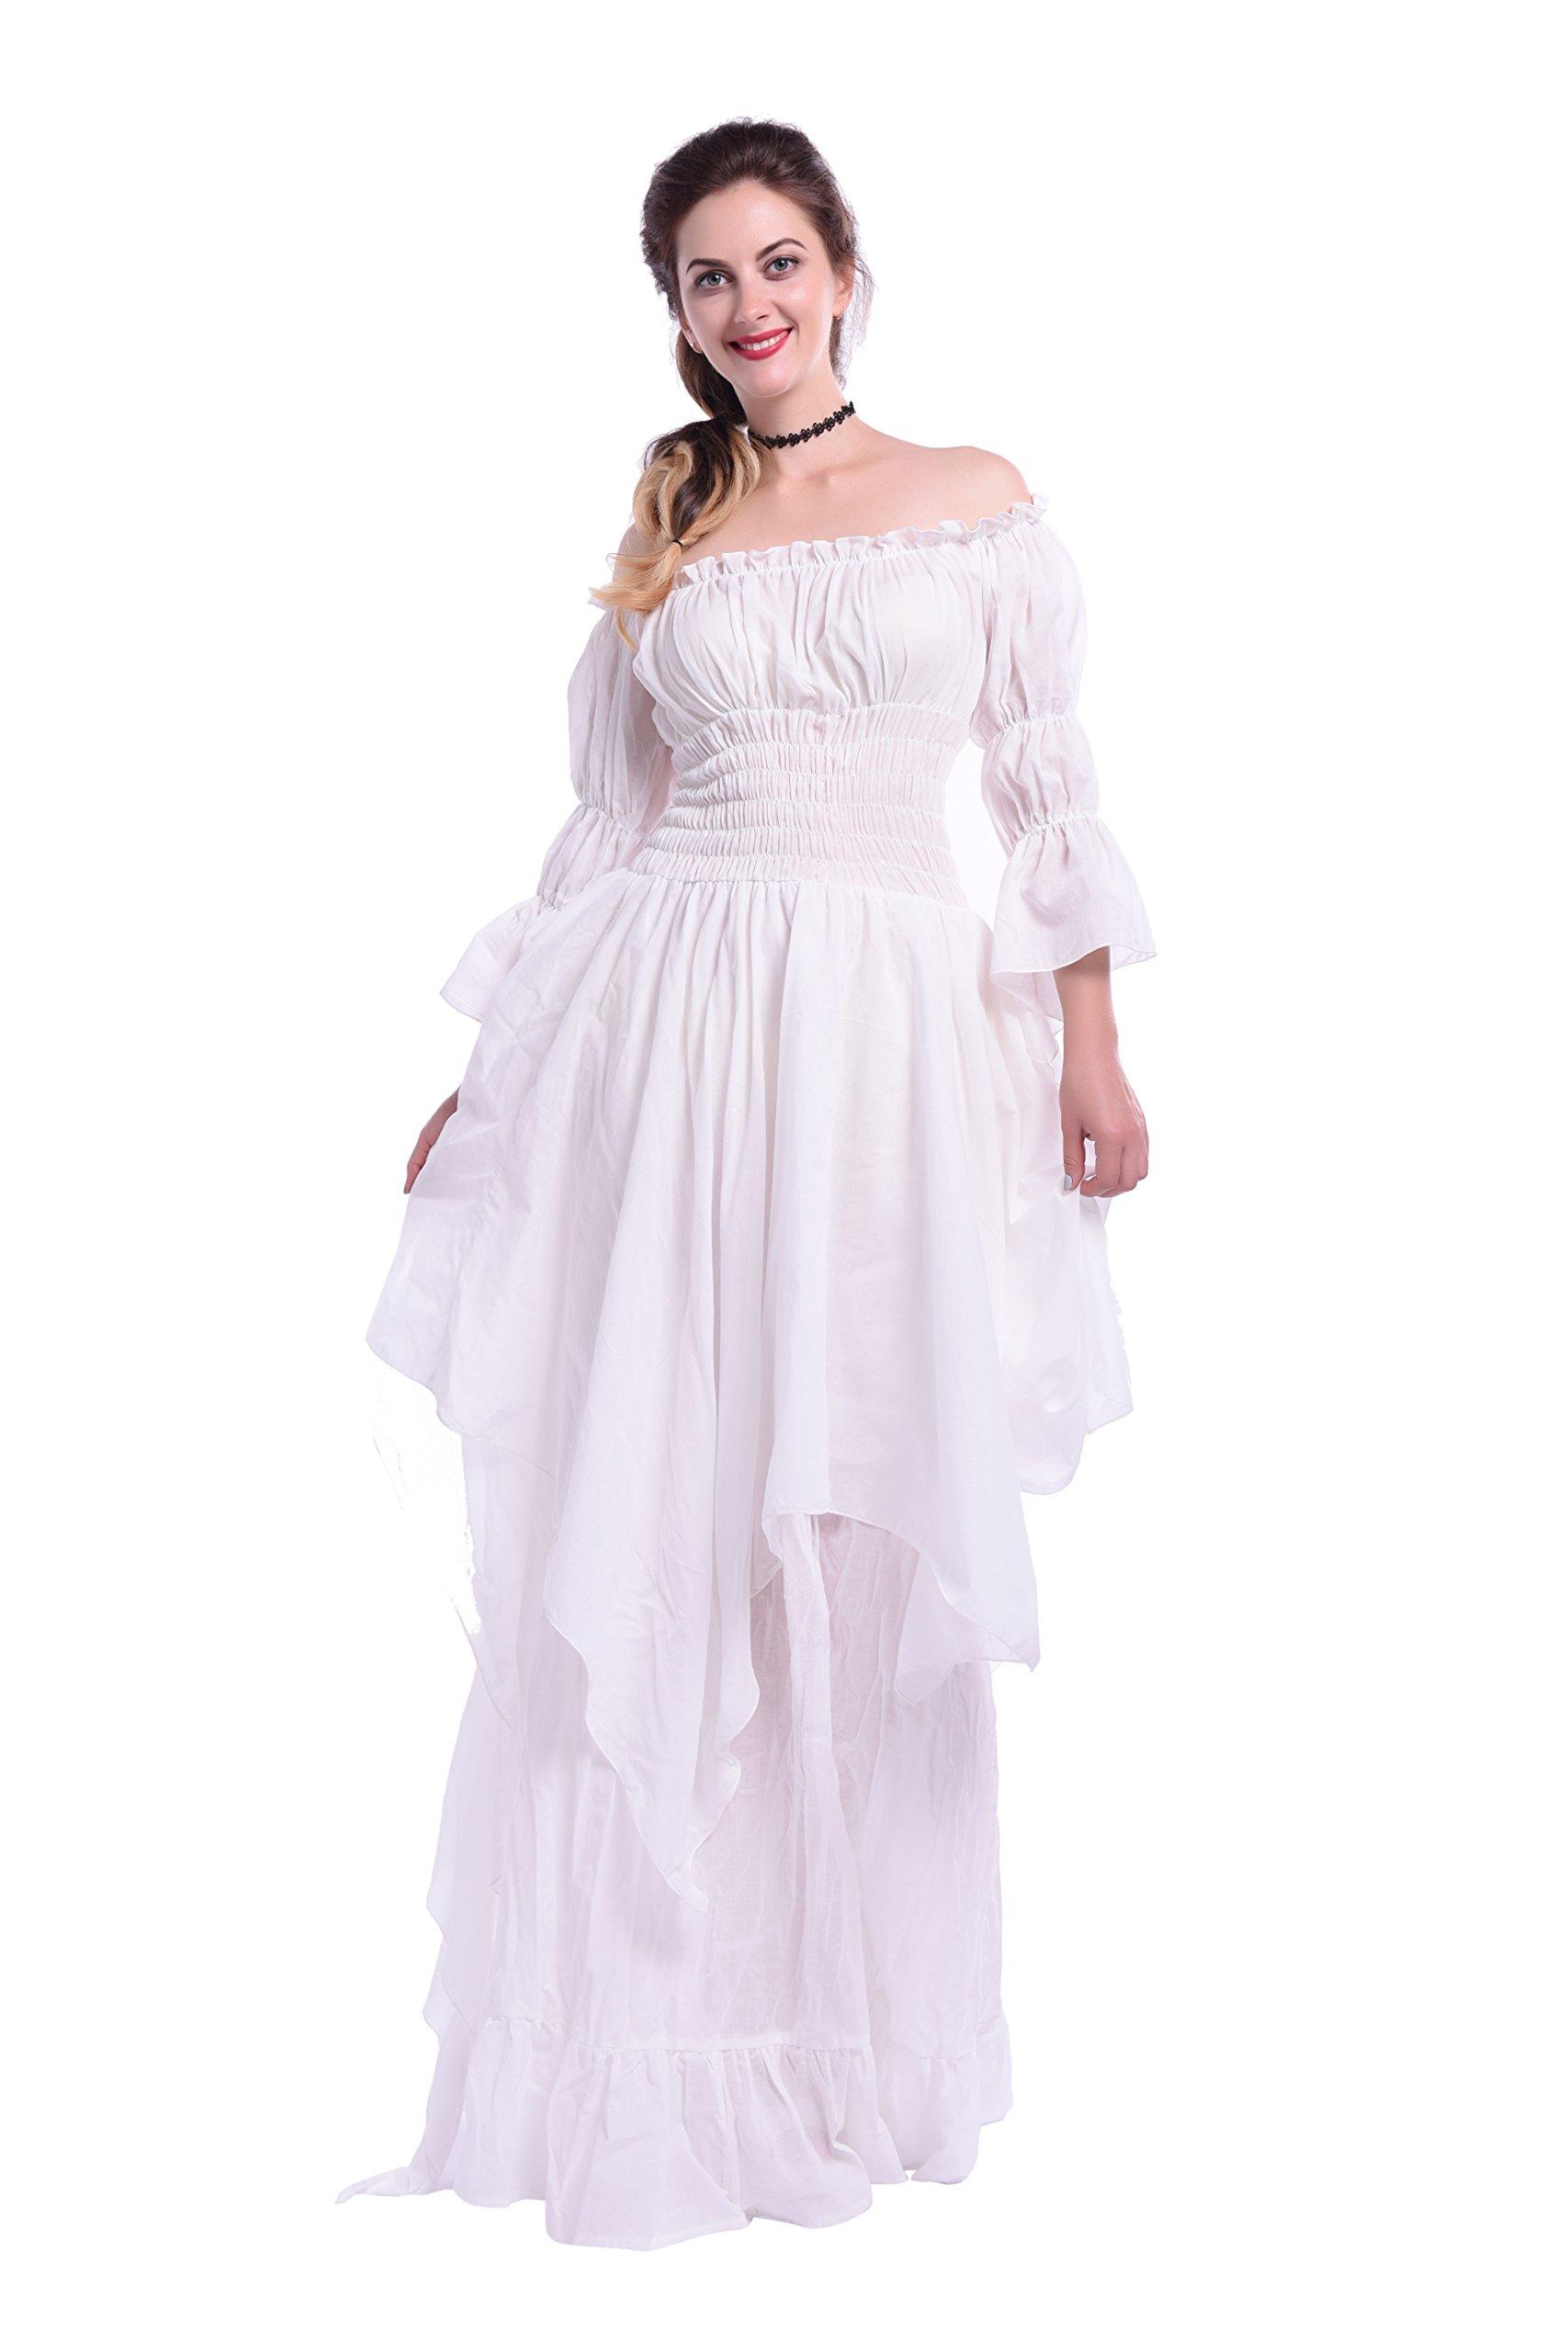 NSPSTT Womens Renaissance Dresses Irregular Sleeves Smocked Waist Tiered Maxi Dress (Large, White-2)